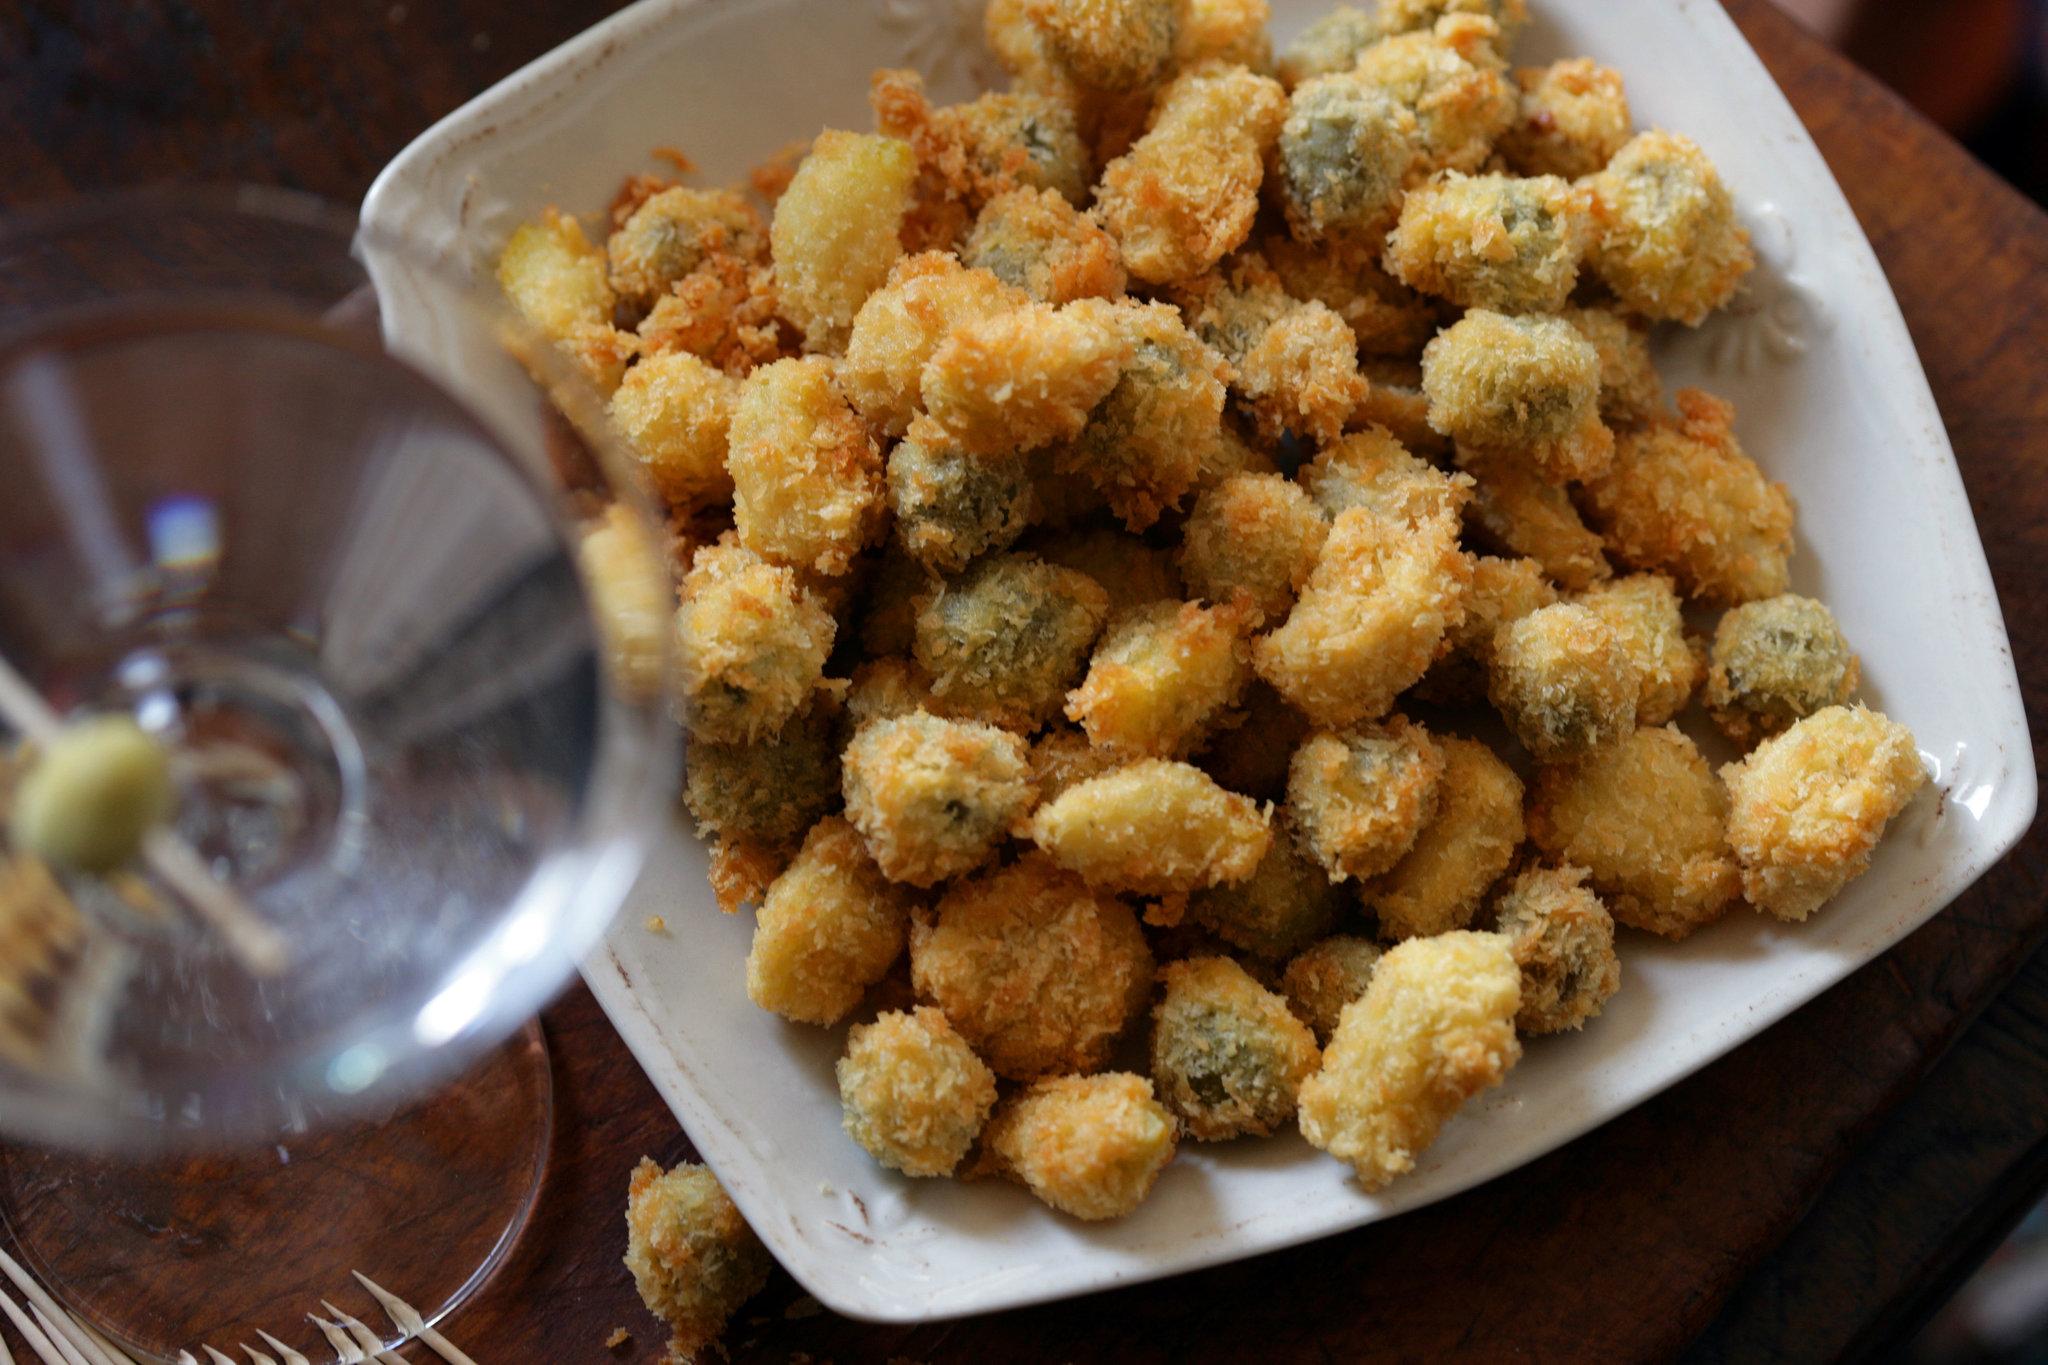 Glomorous Garlic Cloves Green Olives Recipe Nyt Cooking Deep Fryer Recipes Australia Deep Fryer Recipes Potatoes nice food Deep Fryer Recipes